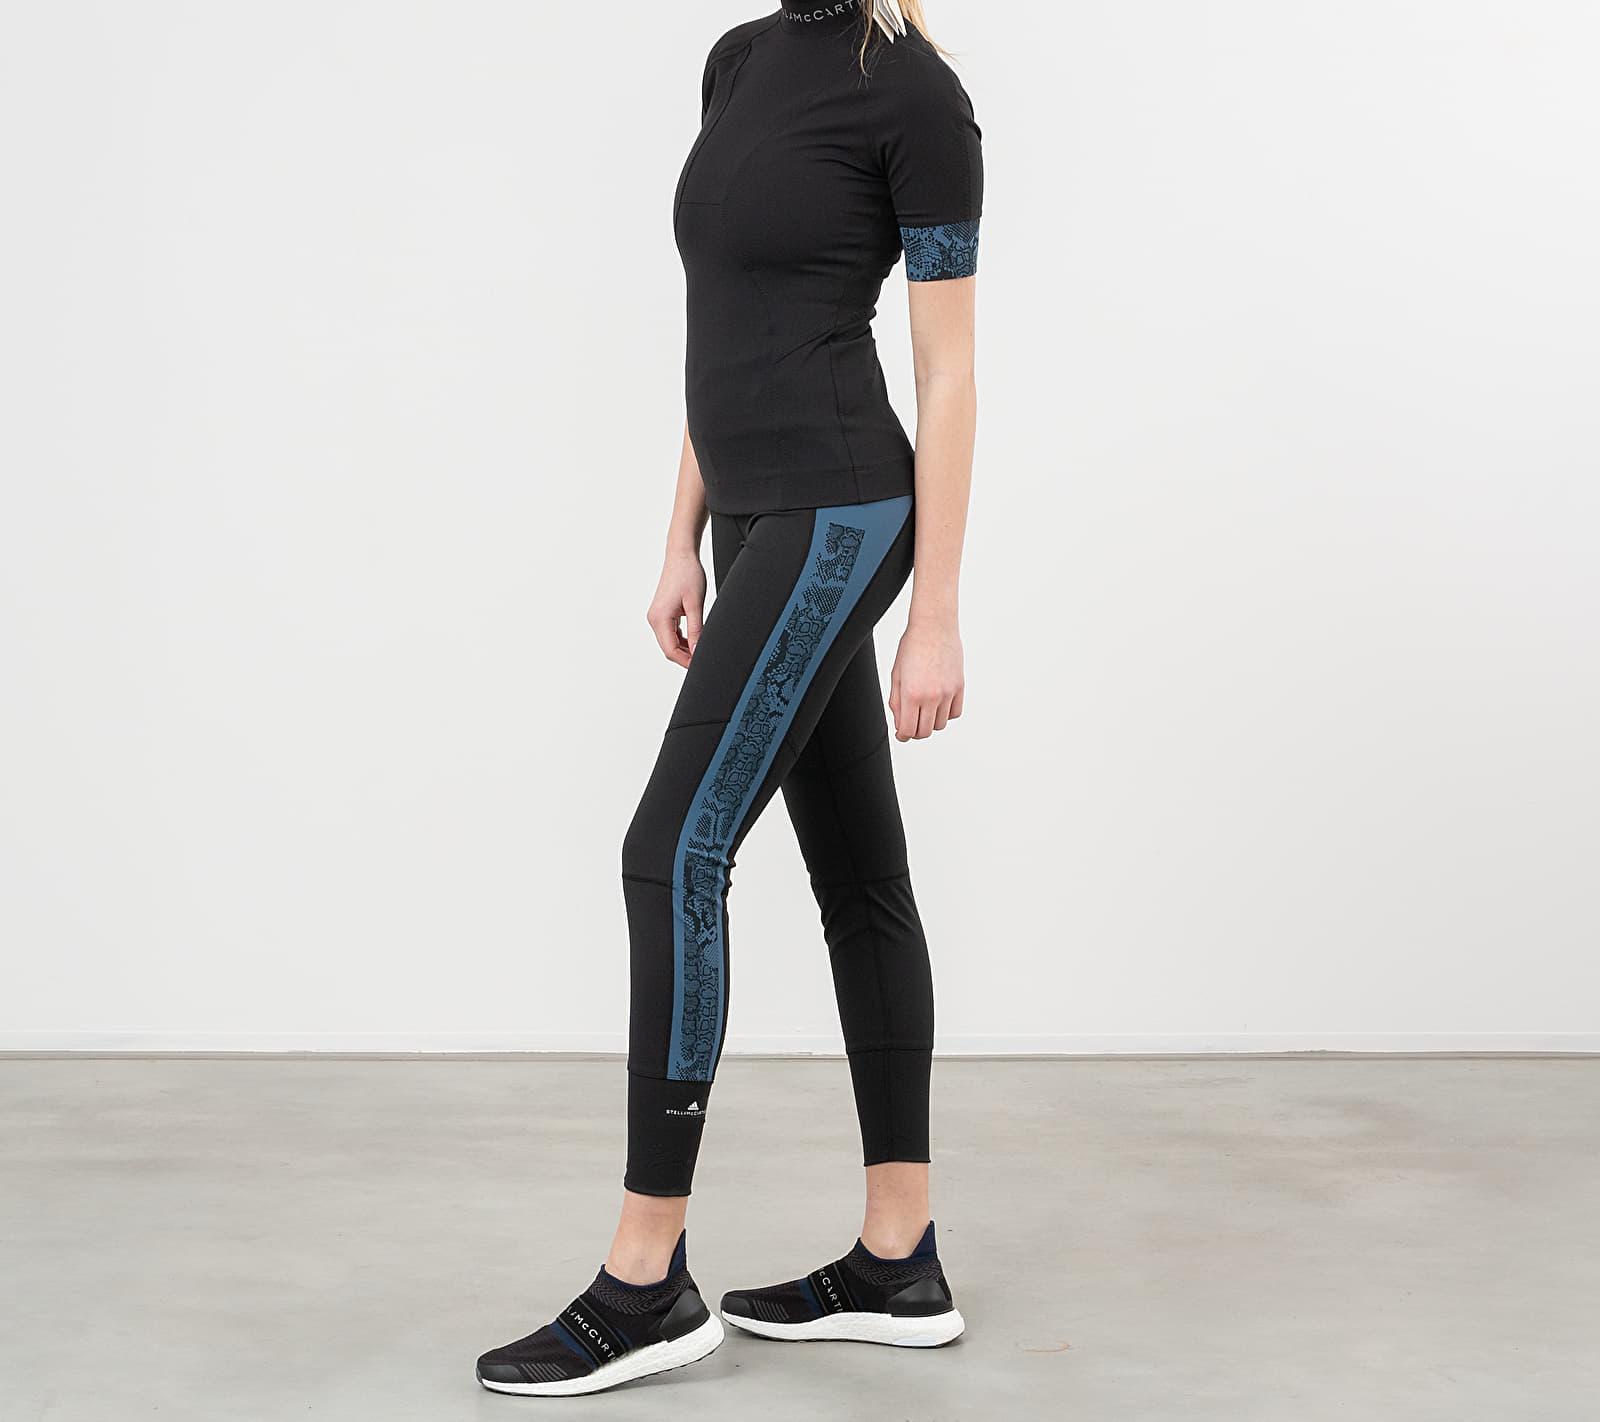 adidas x Stella McCartney Run Tights HEAT.RDY Black/ Vista Blue XS